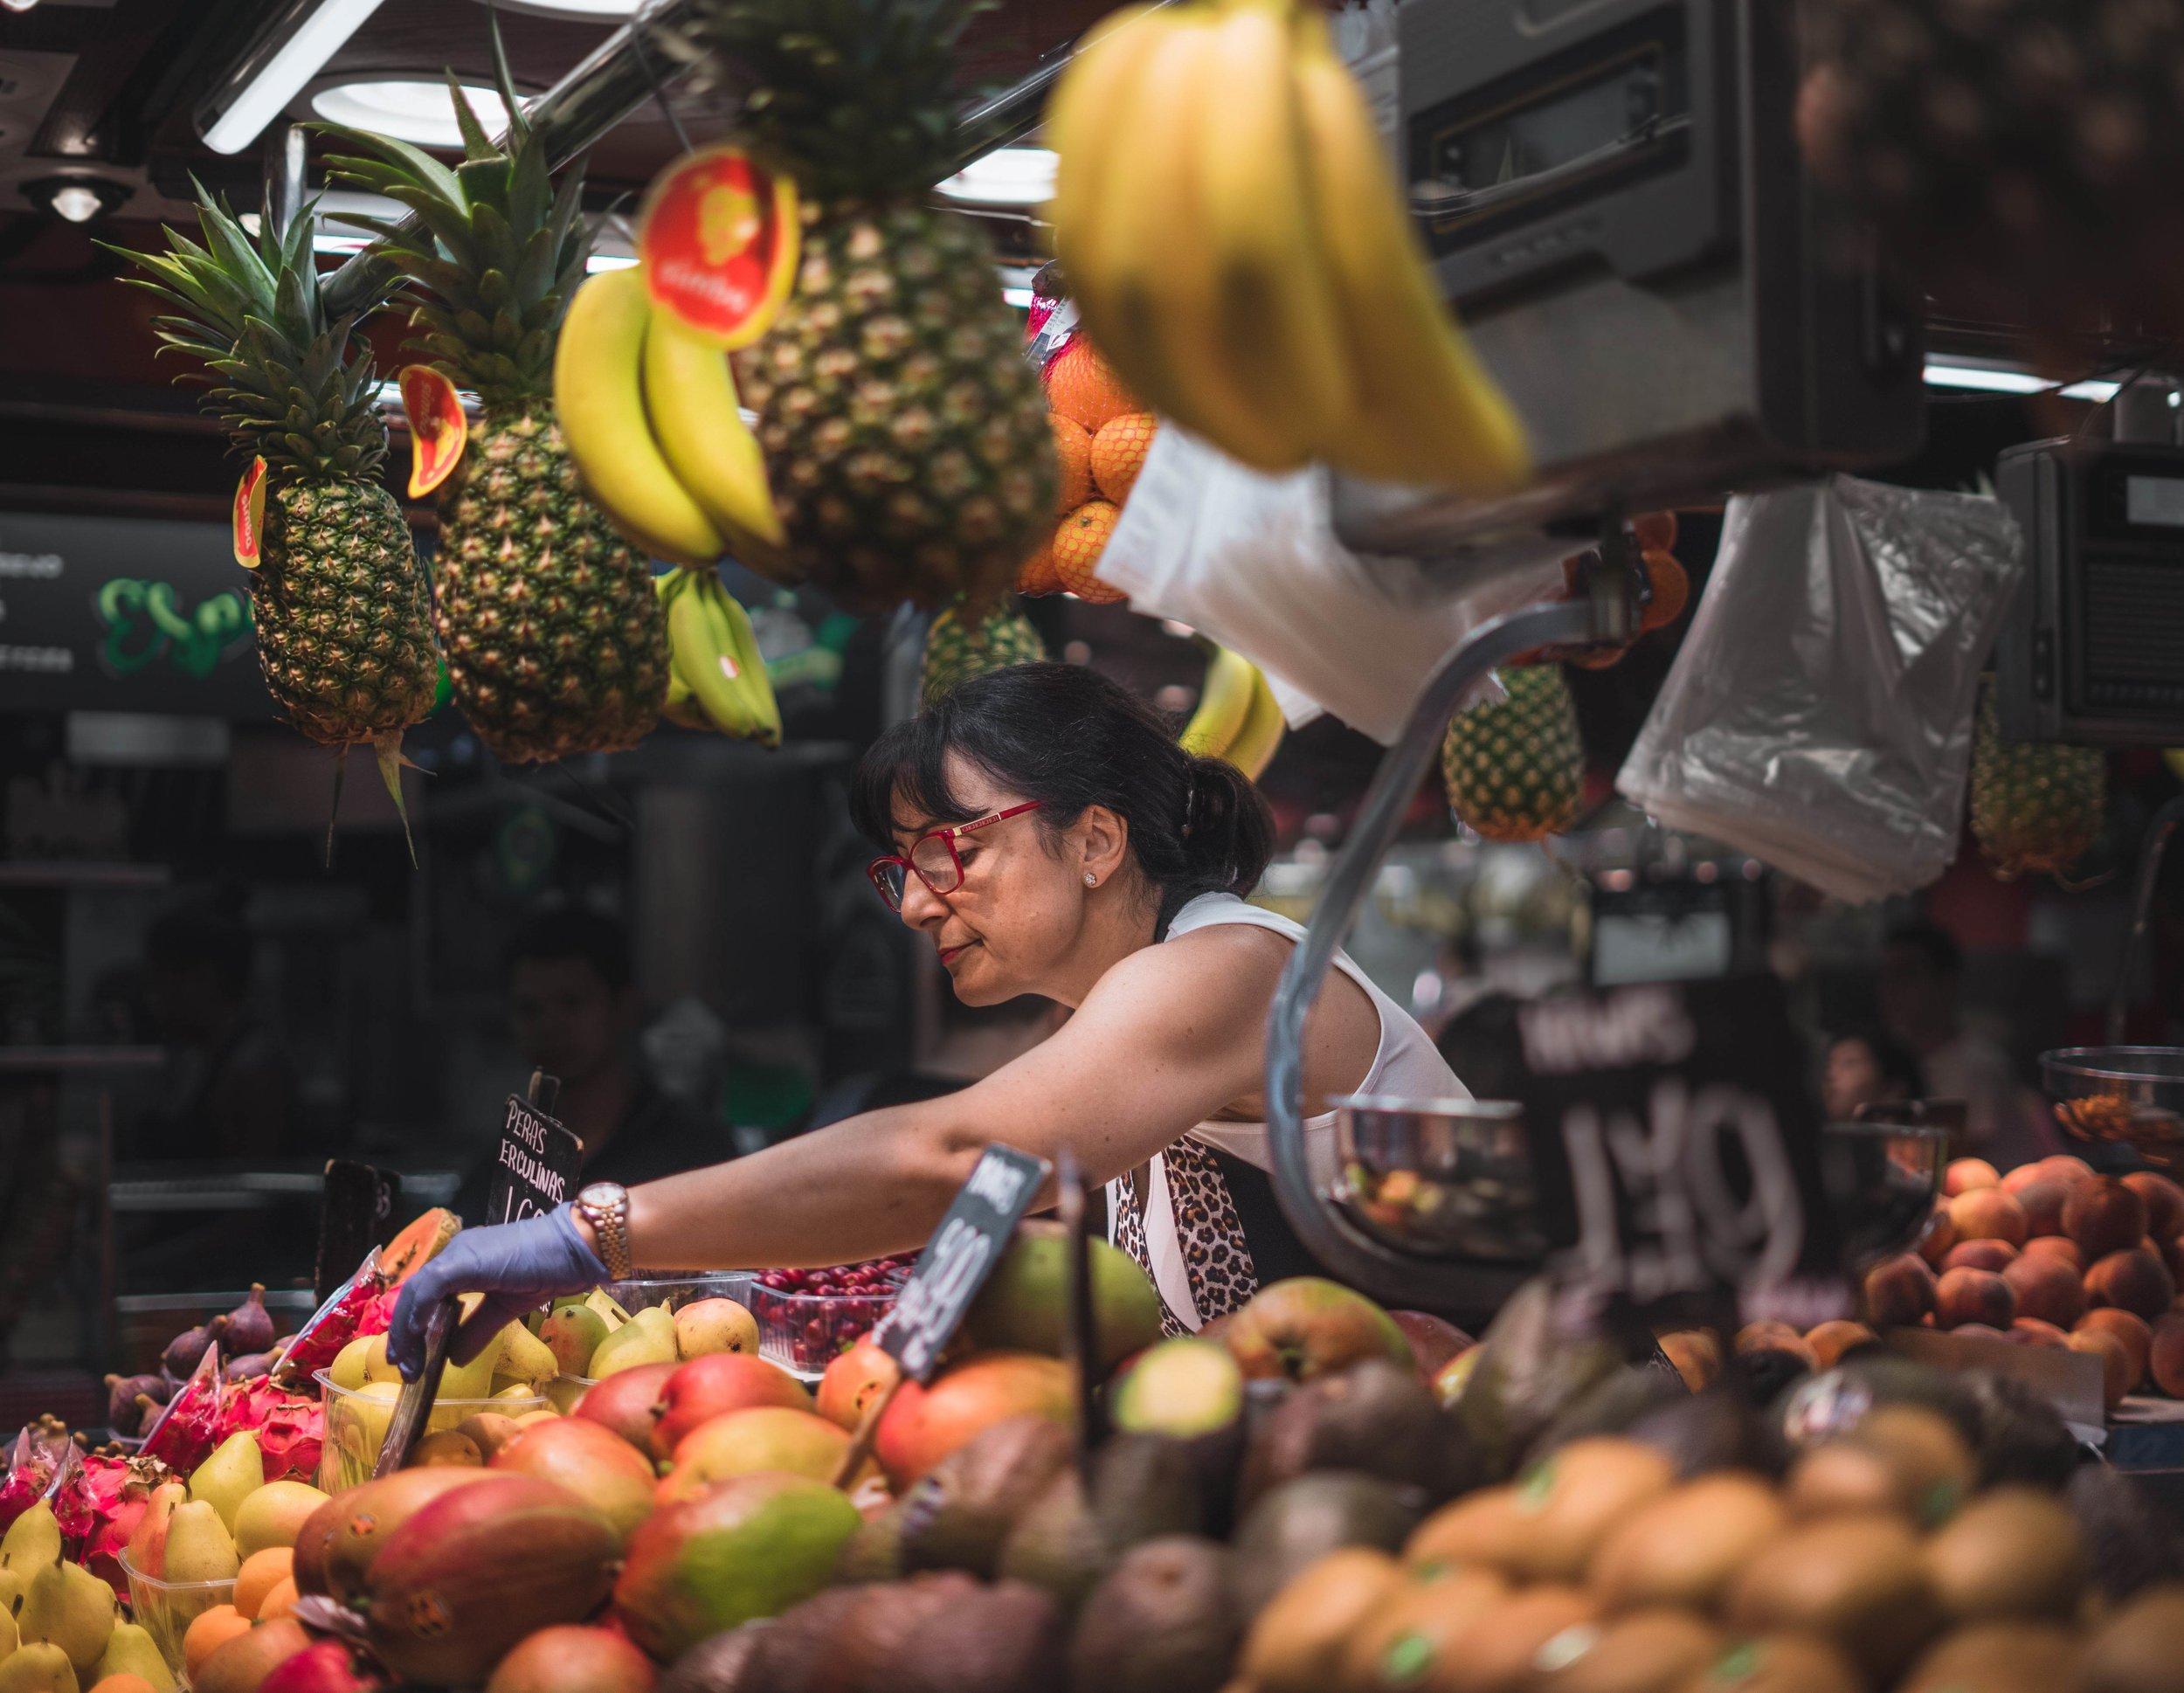 pineapple 2.jpg